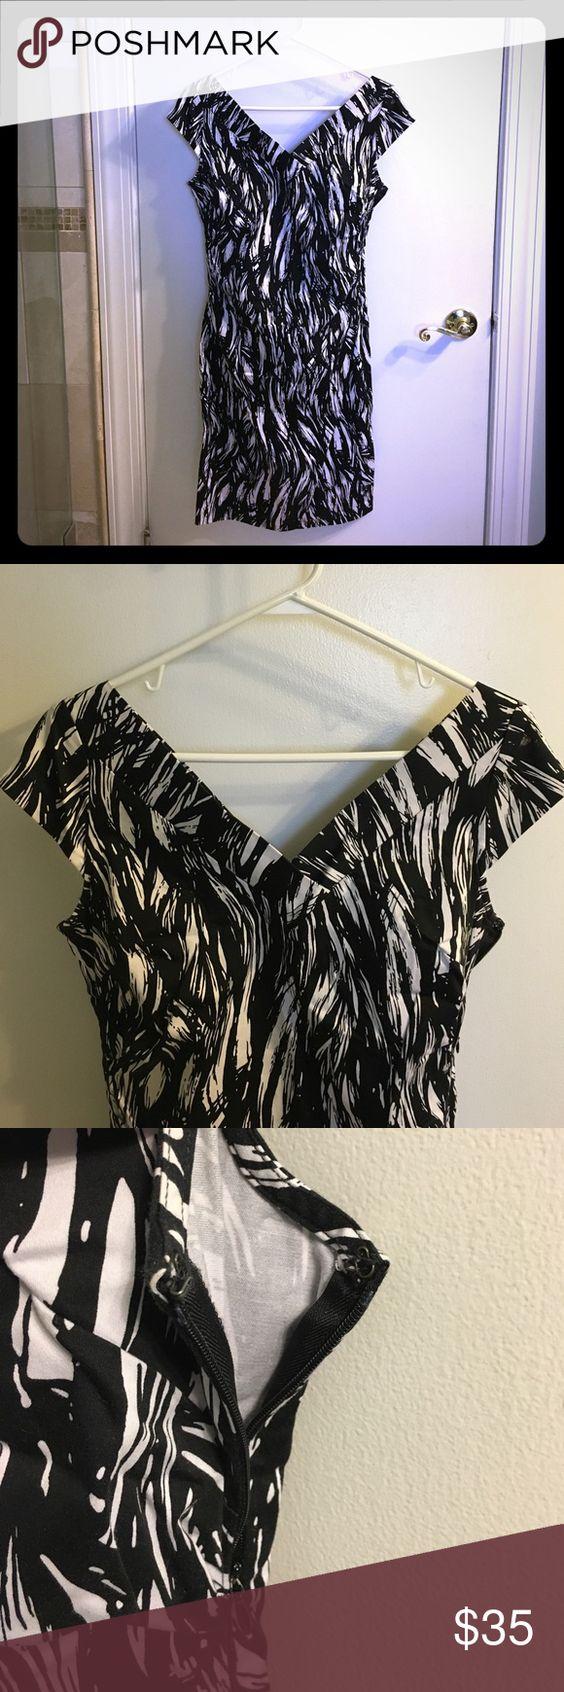 Black and white New York & Co. dress Fitted black and white cotton blend New York & Co. dress, with wide v-neck detail and slit at back bottom. Hem hits around knees. New York & Company Dresses Midi